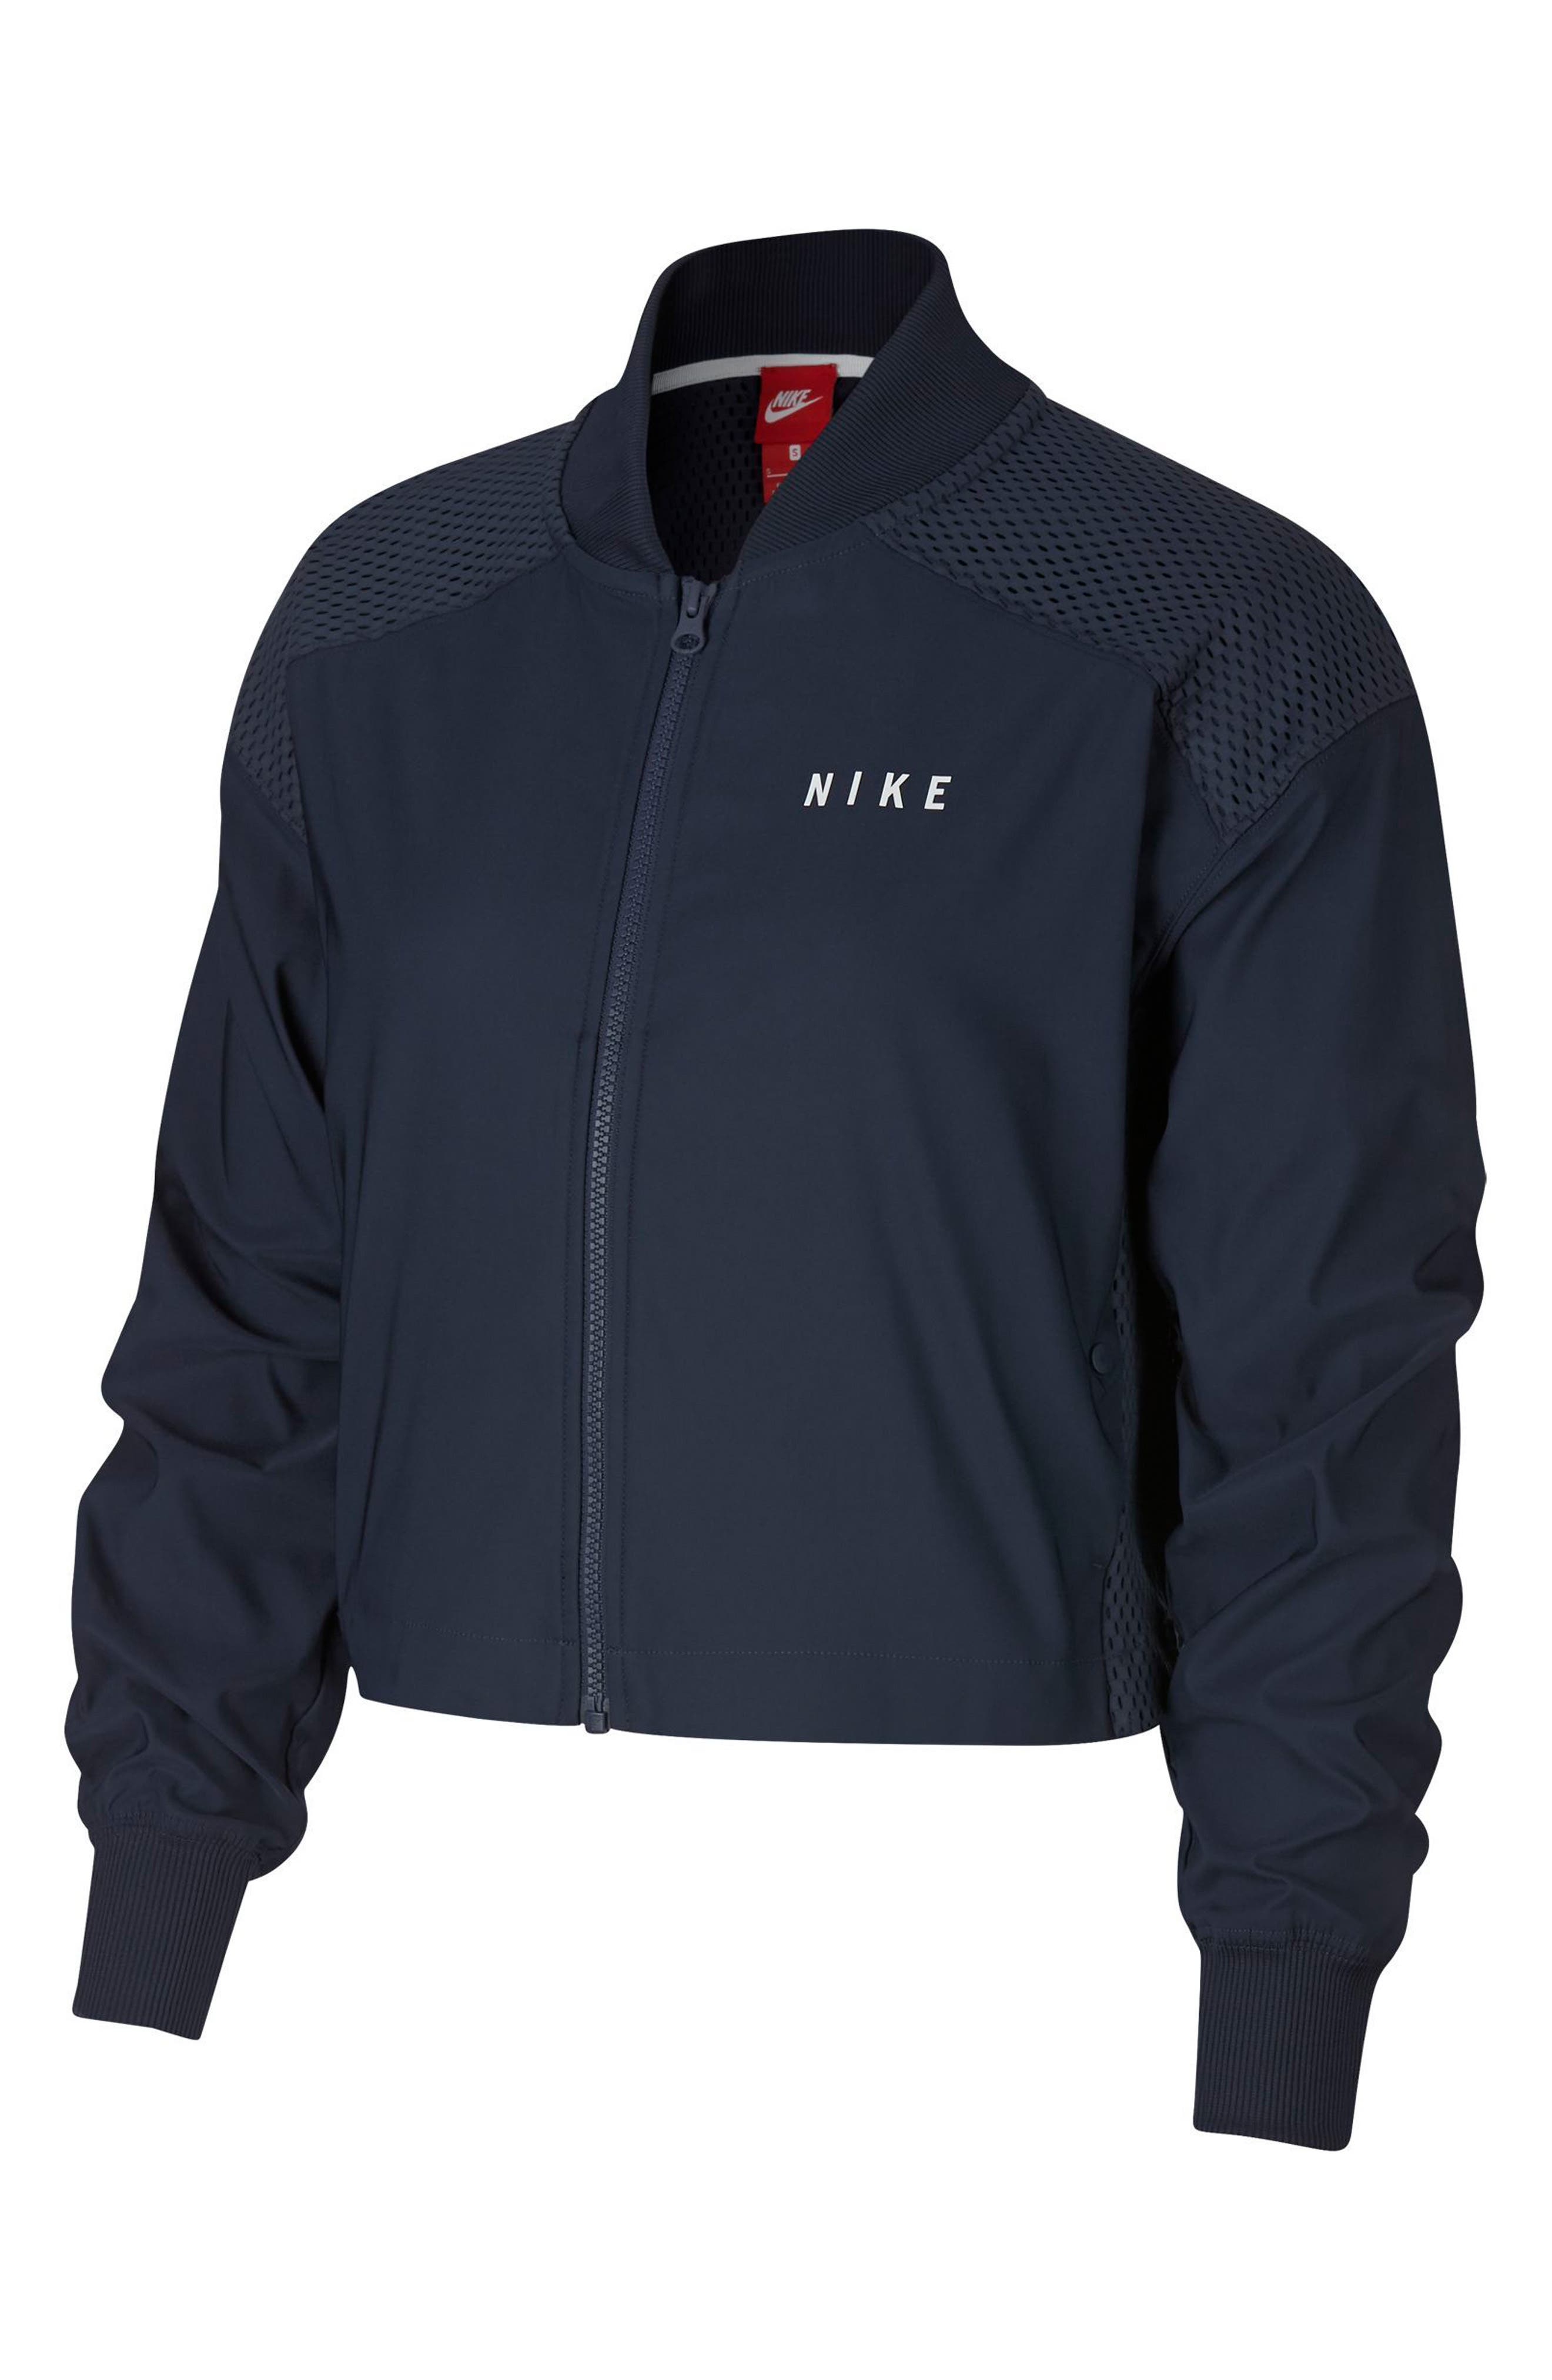 Sportswear Women's Dry Bomber Jacket,                             Main thumbnail 1, color,                             Obsidian/ White